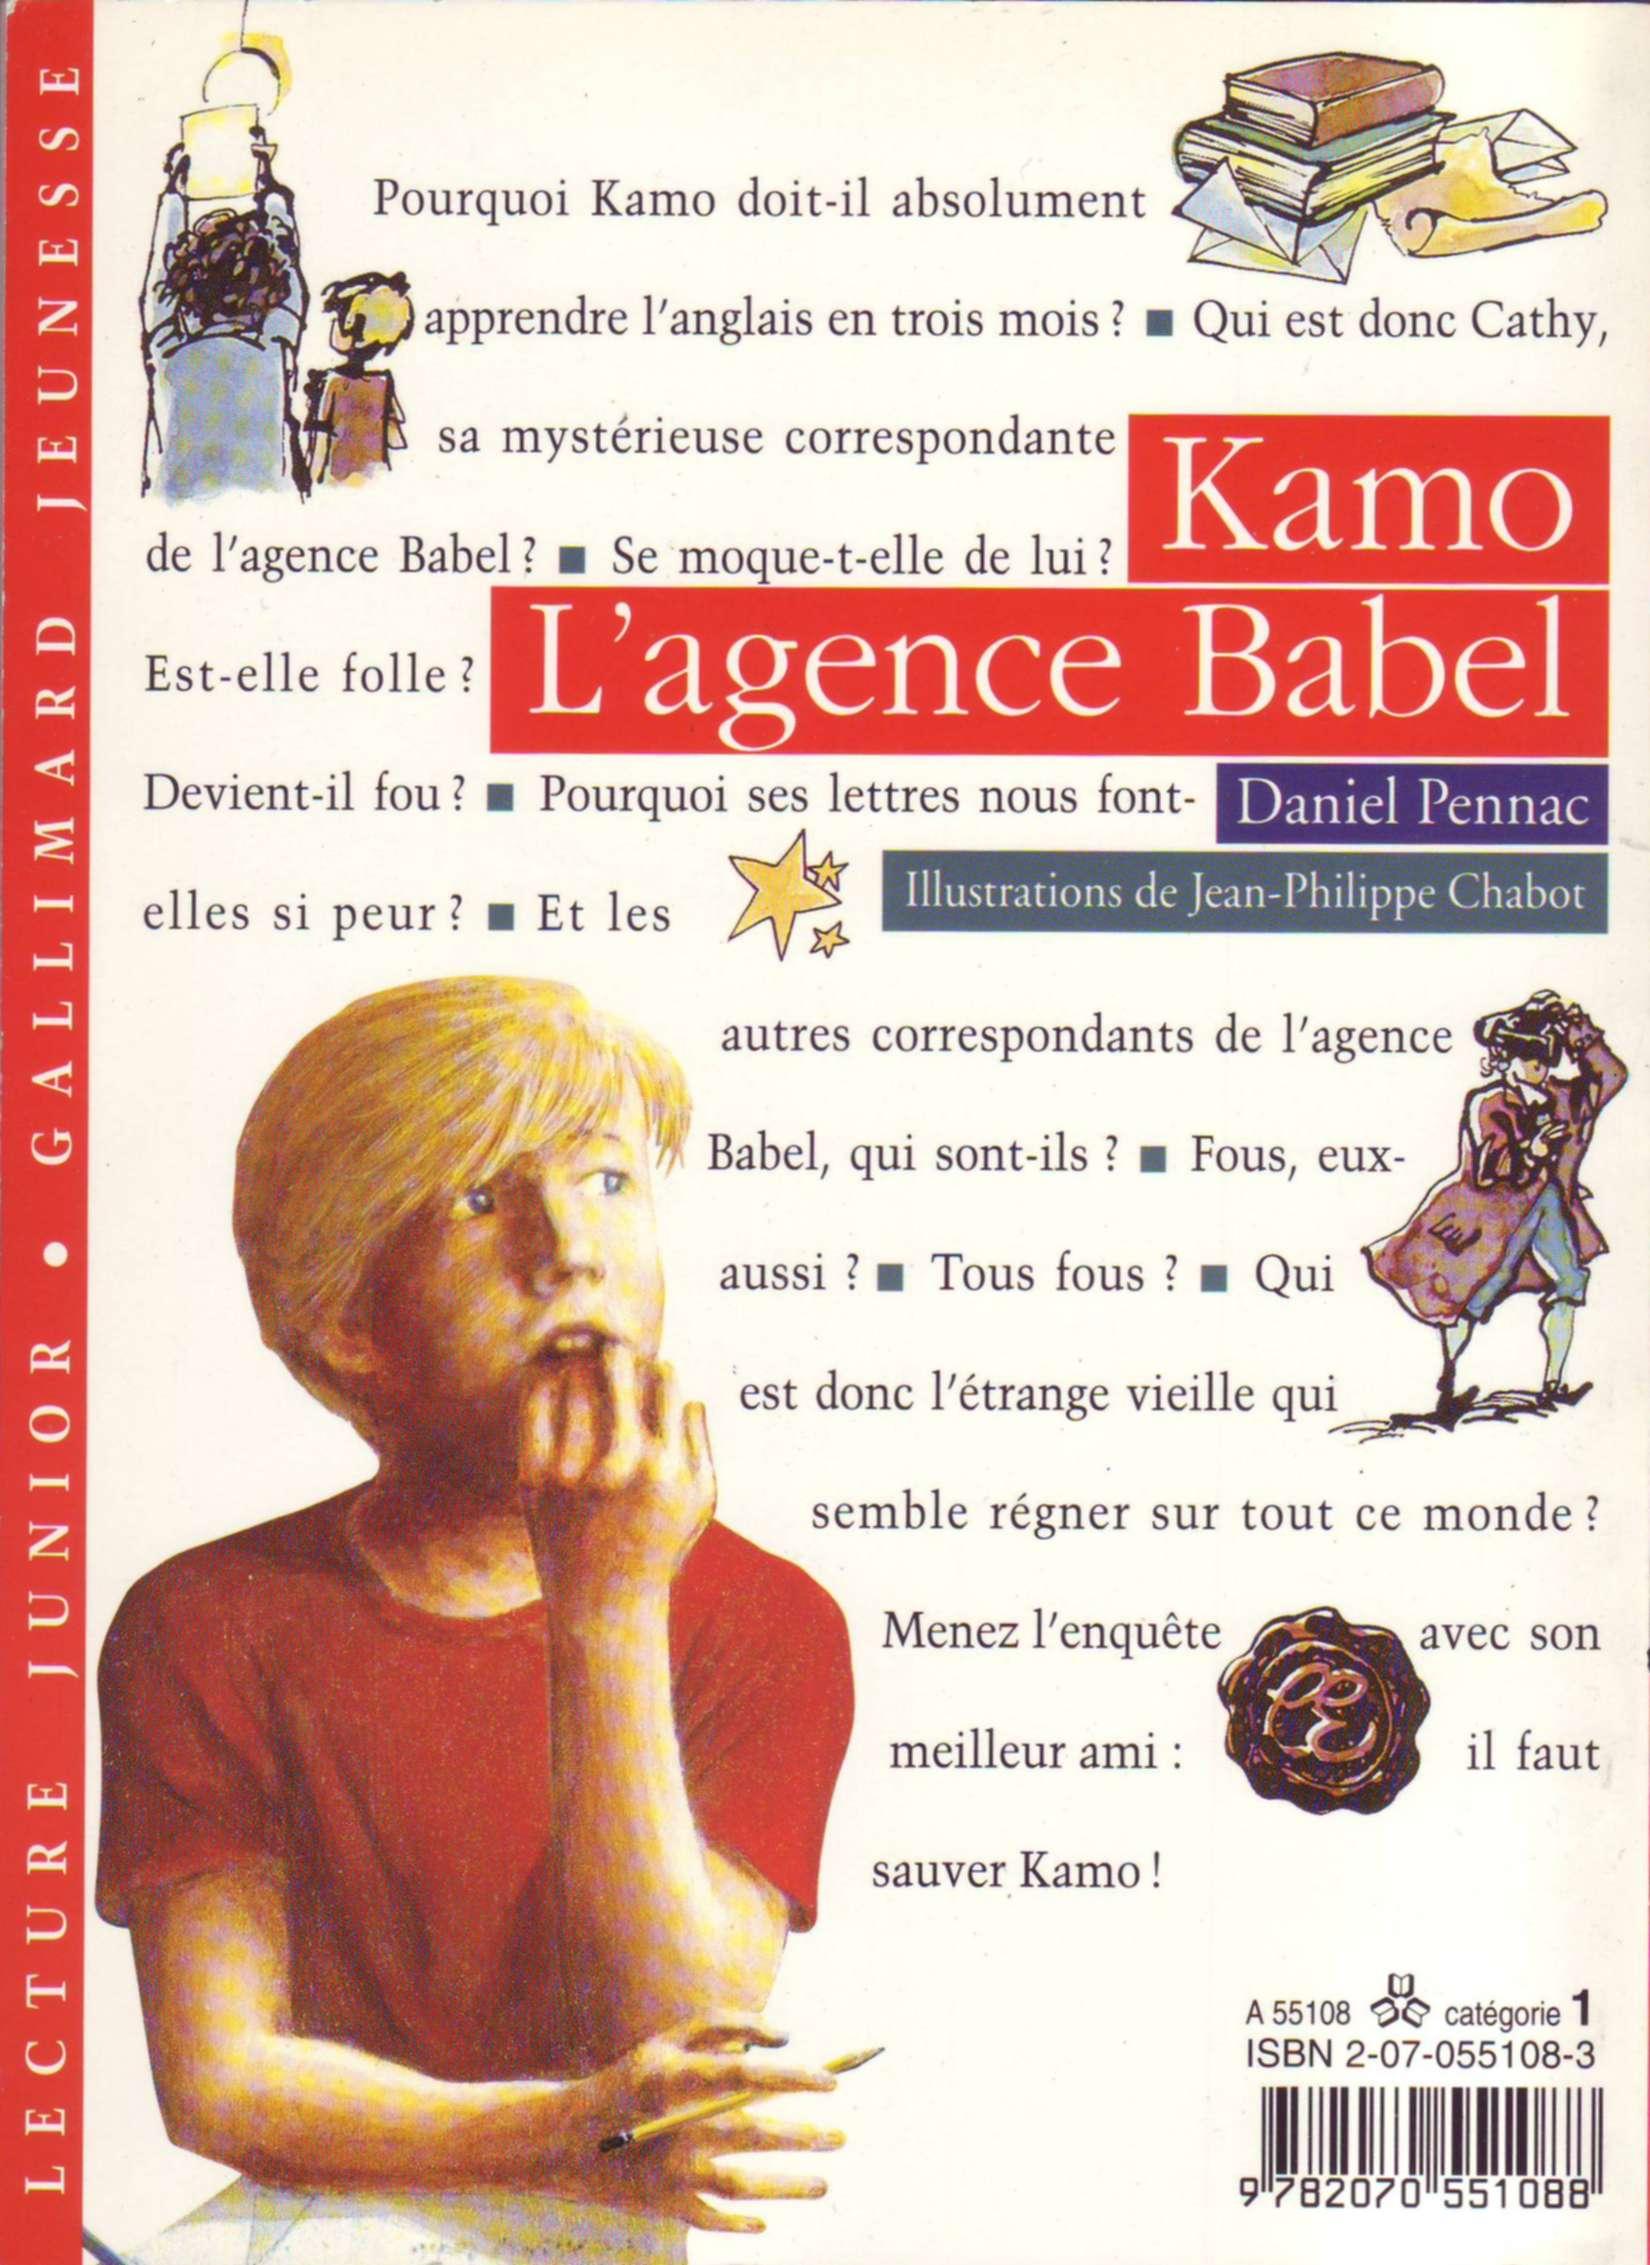 Kamo - L'agence Babel